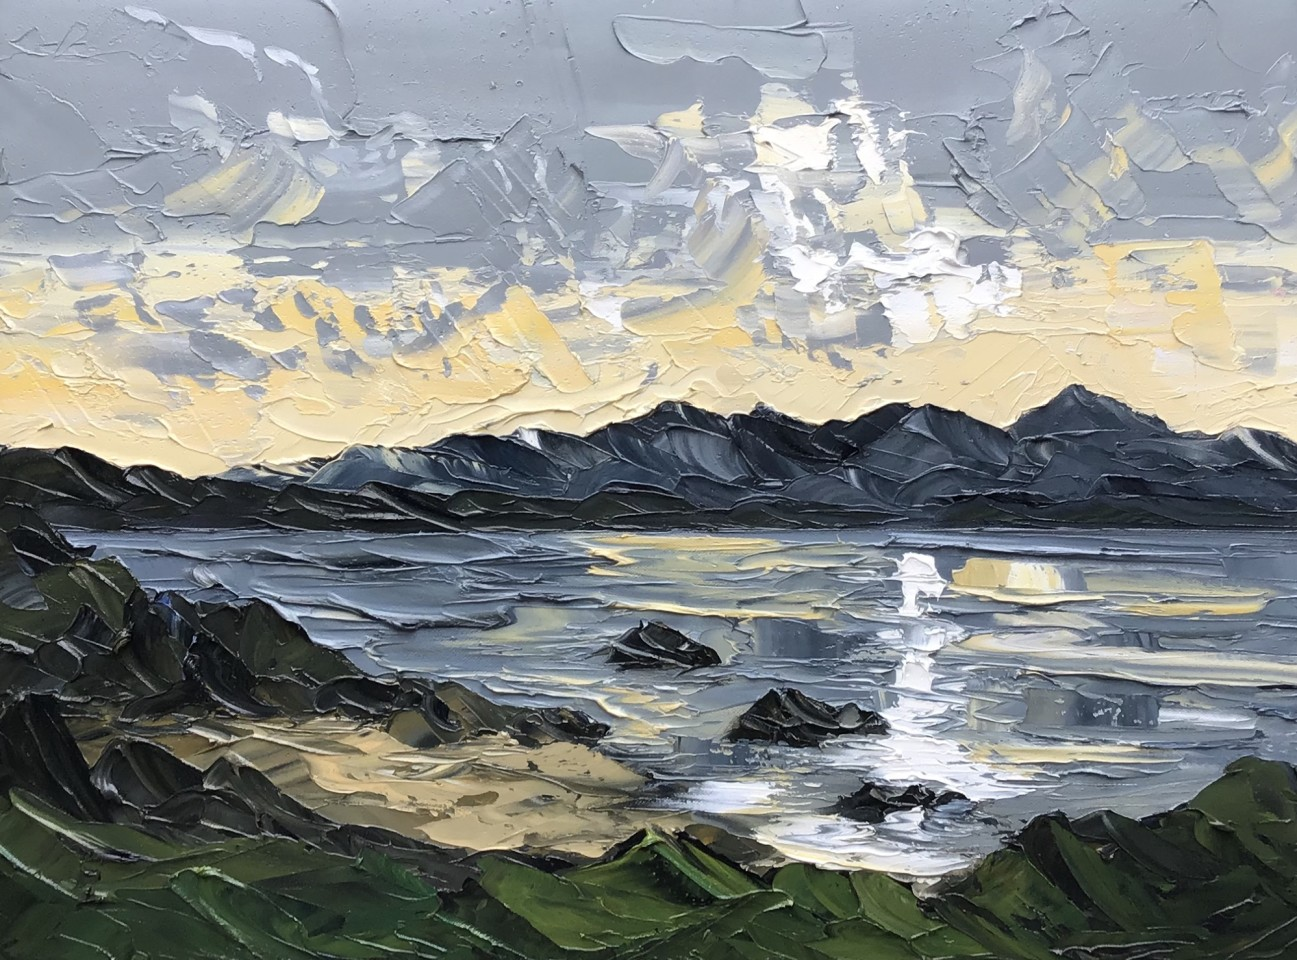 Martin Llewellyn, Early Morning